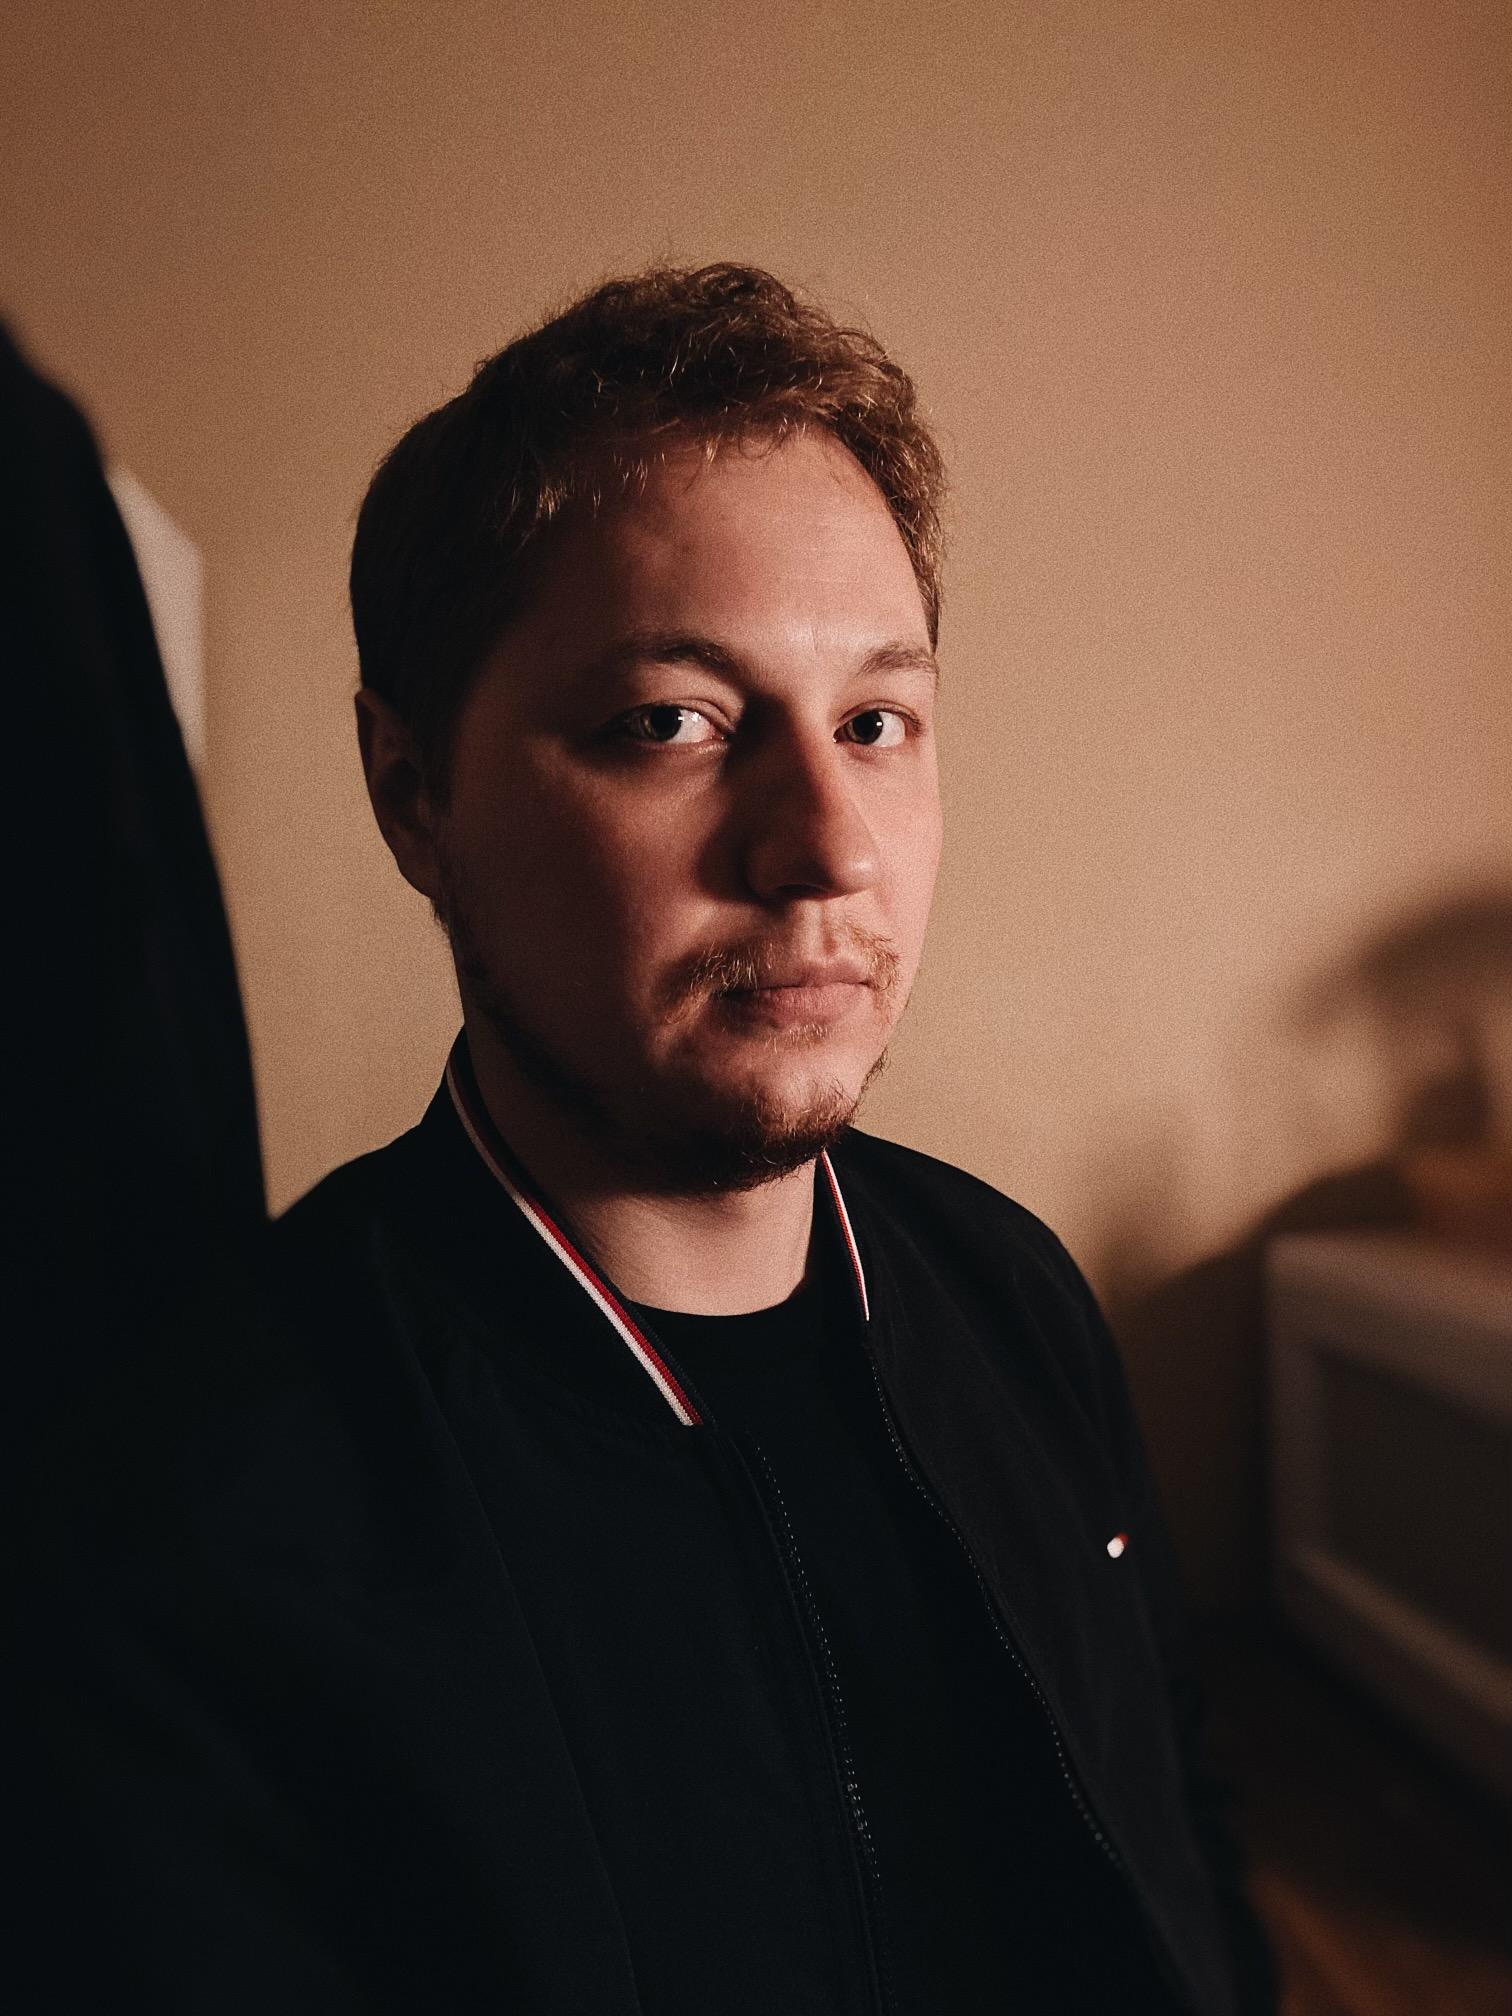 Arthur Gazizov, Film & Television Production Advanced Diploma Program Graduate and aspiring director.